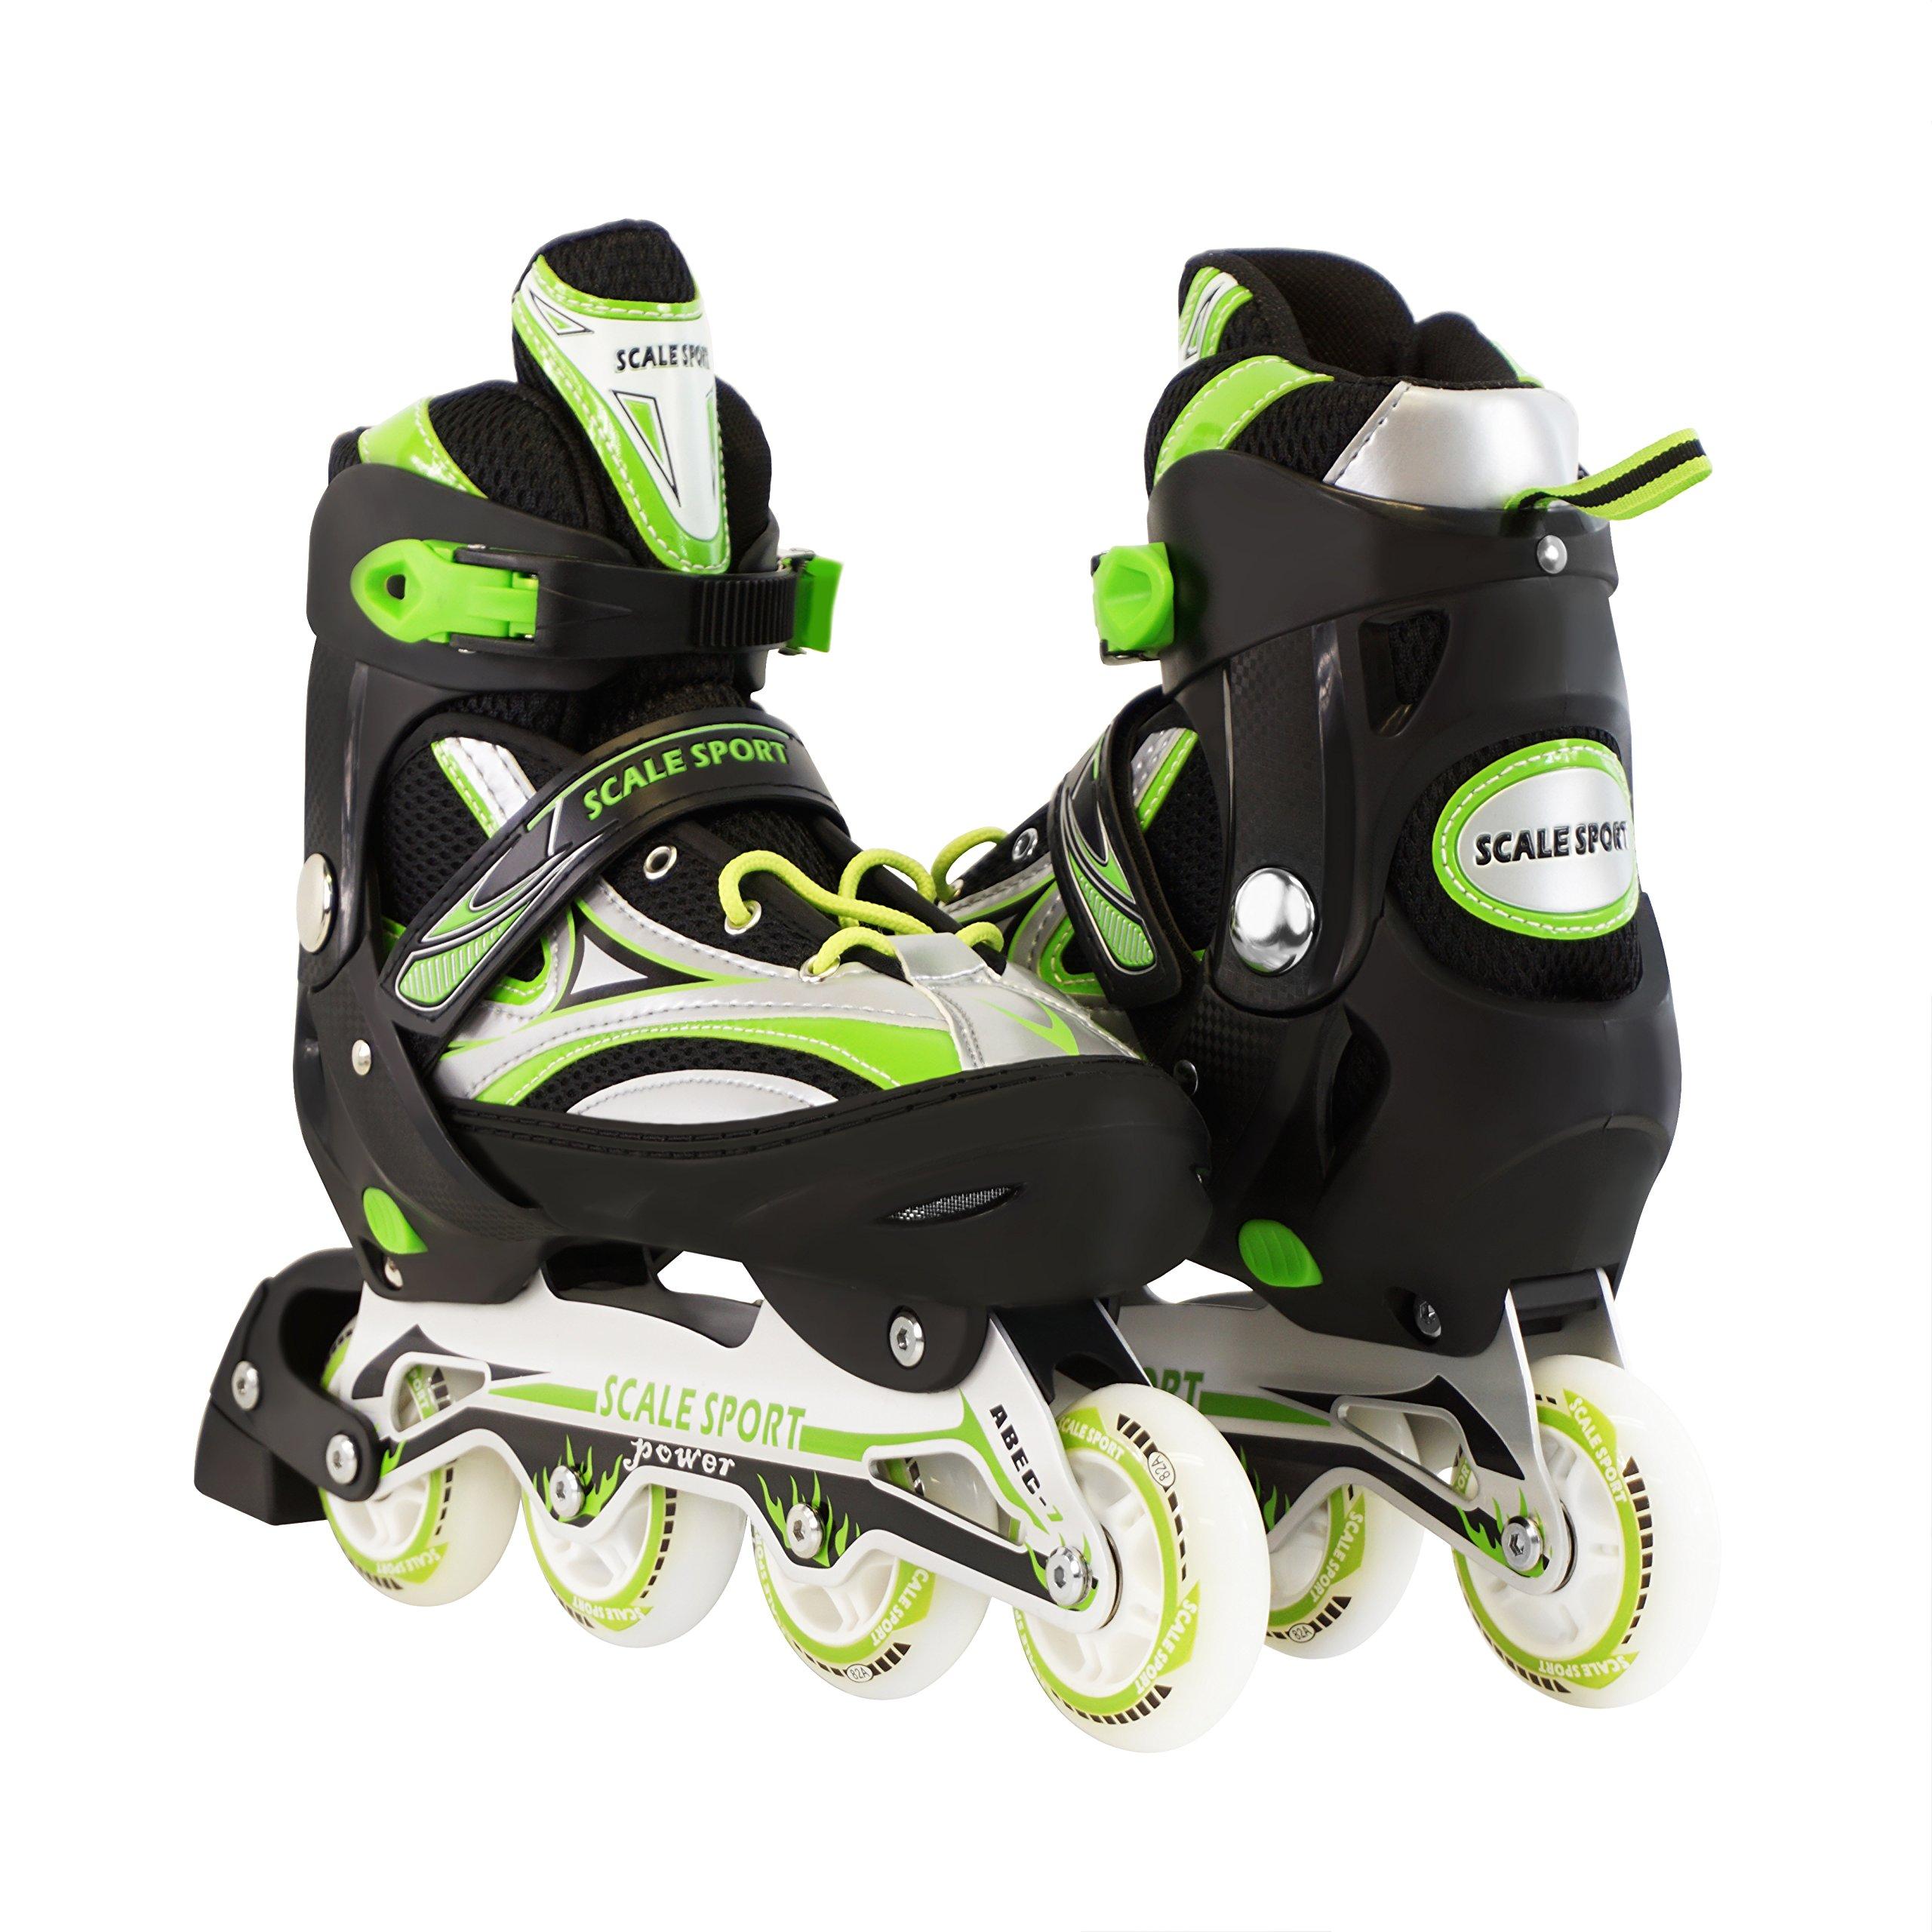 Green Adjustable Inline Skate Size 8-11 US for Men Ladies Teens